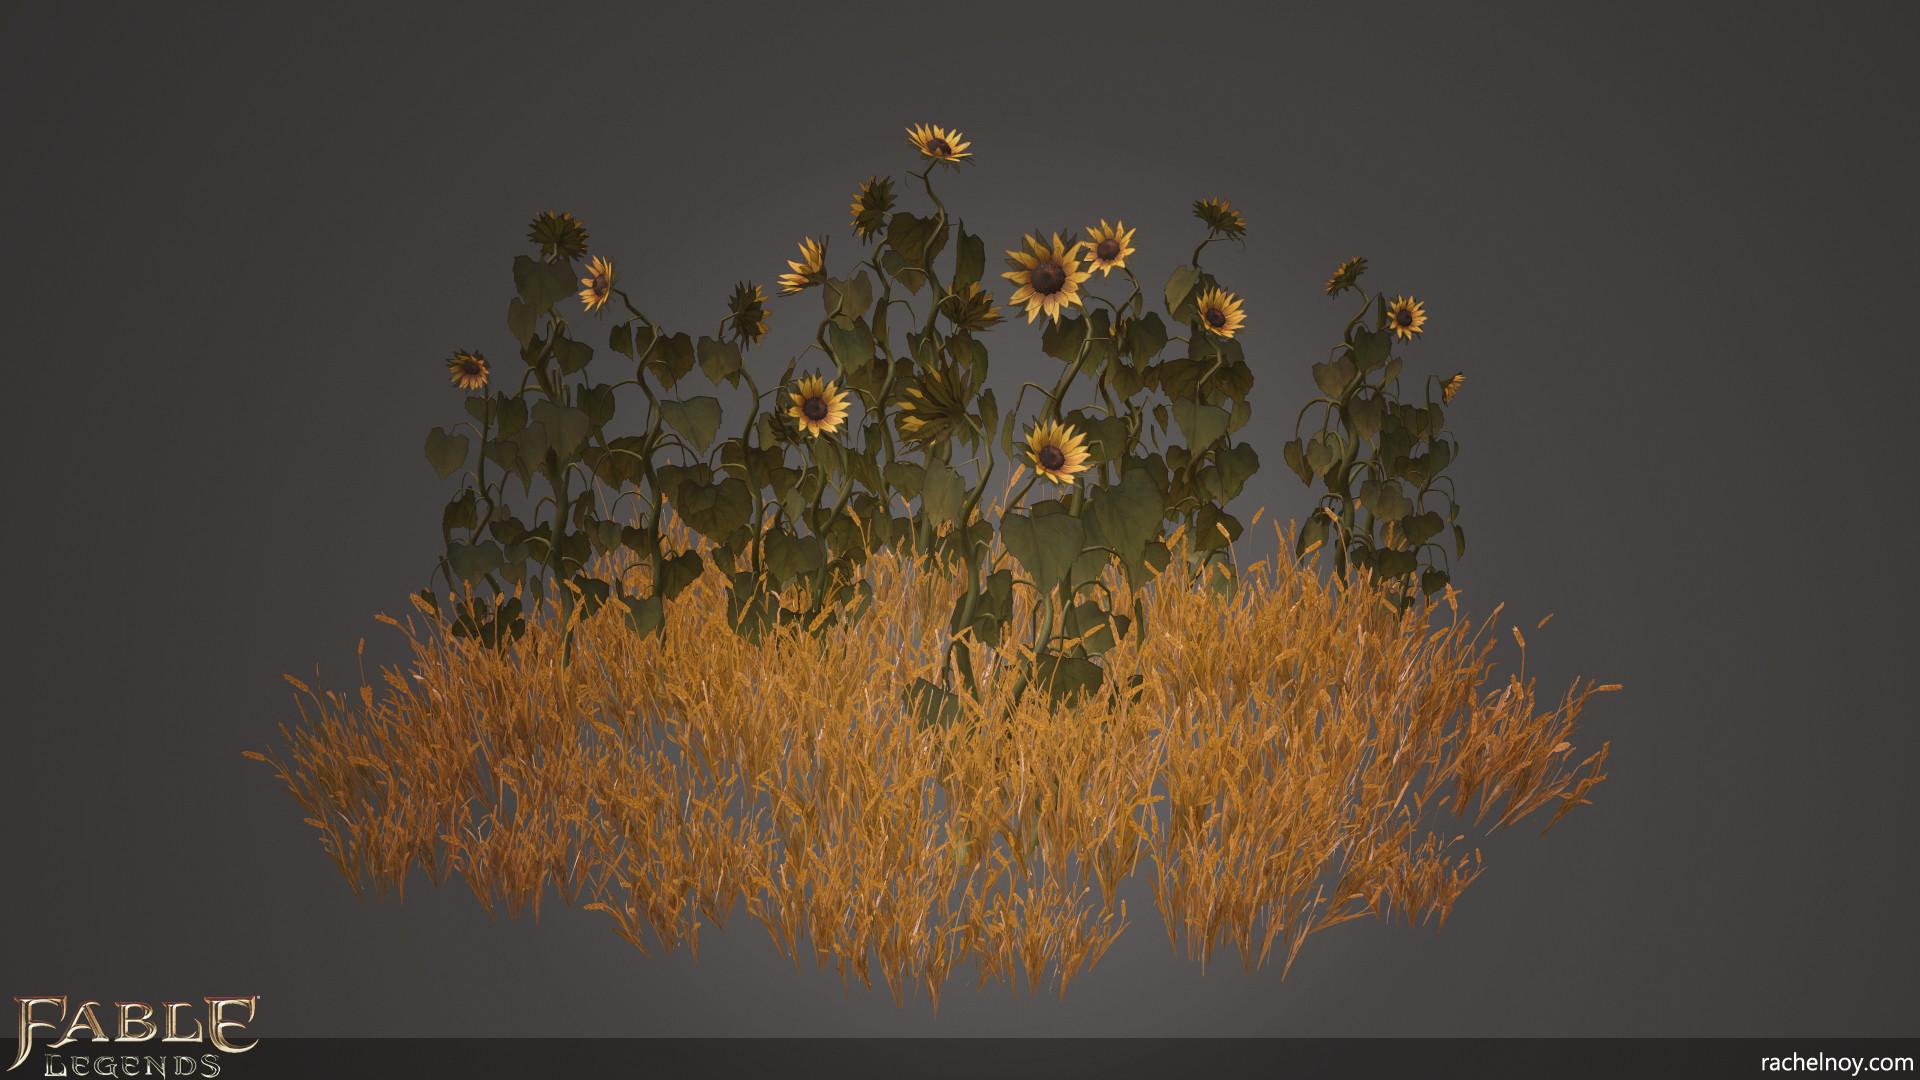 Rachel noy sunflowers2